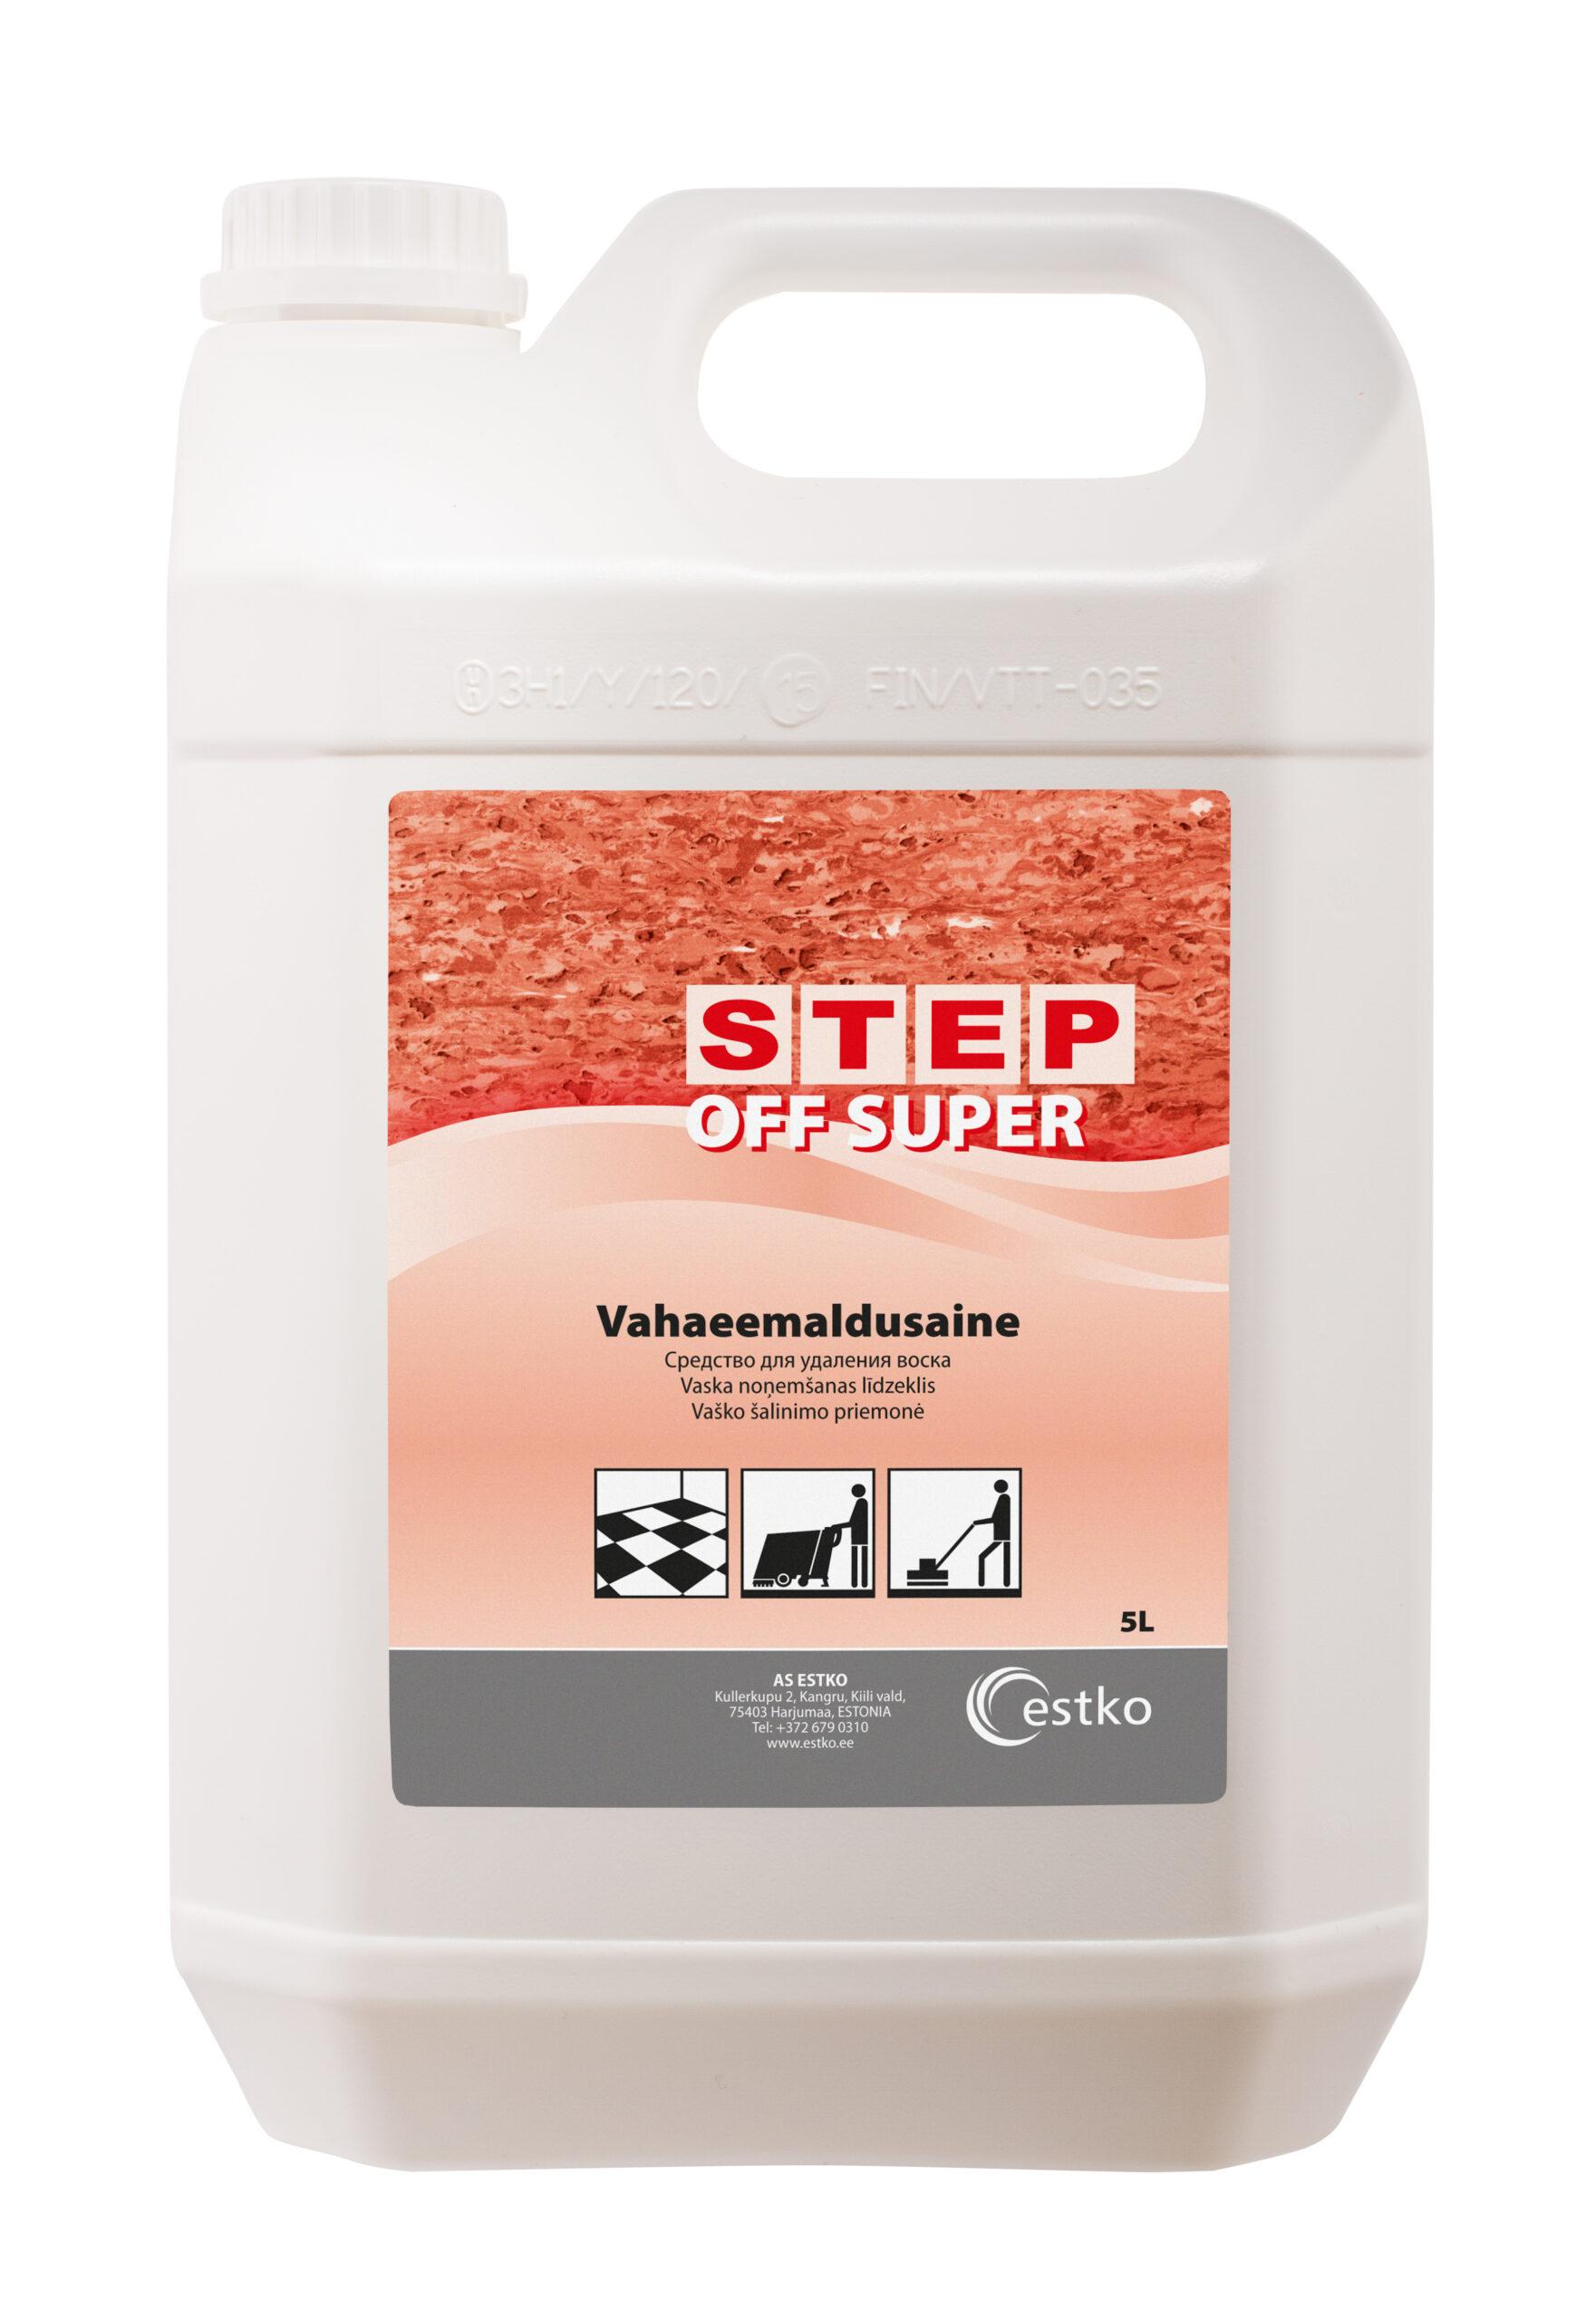 STEP Off Super